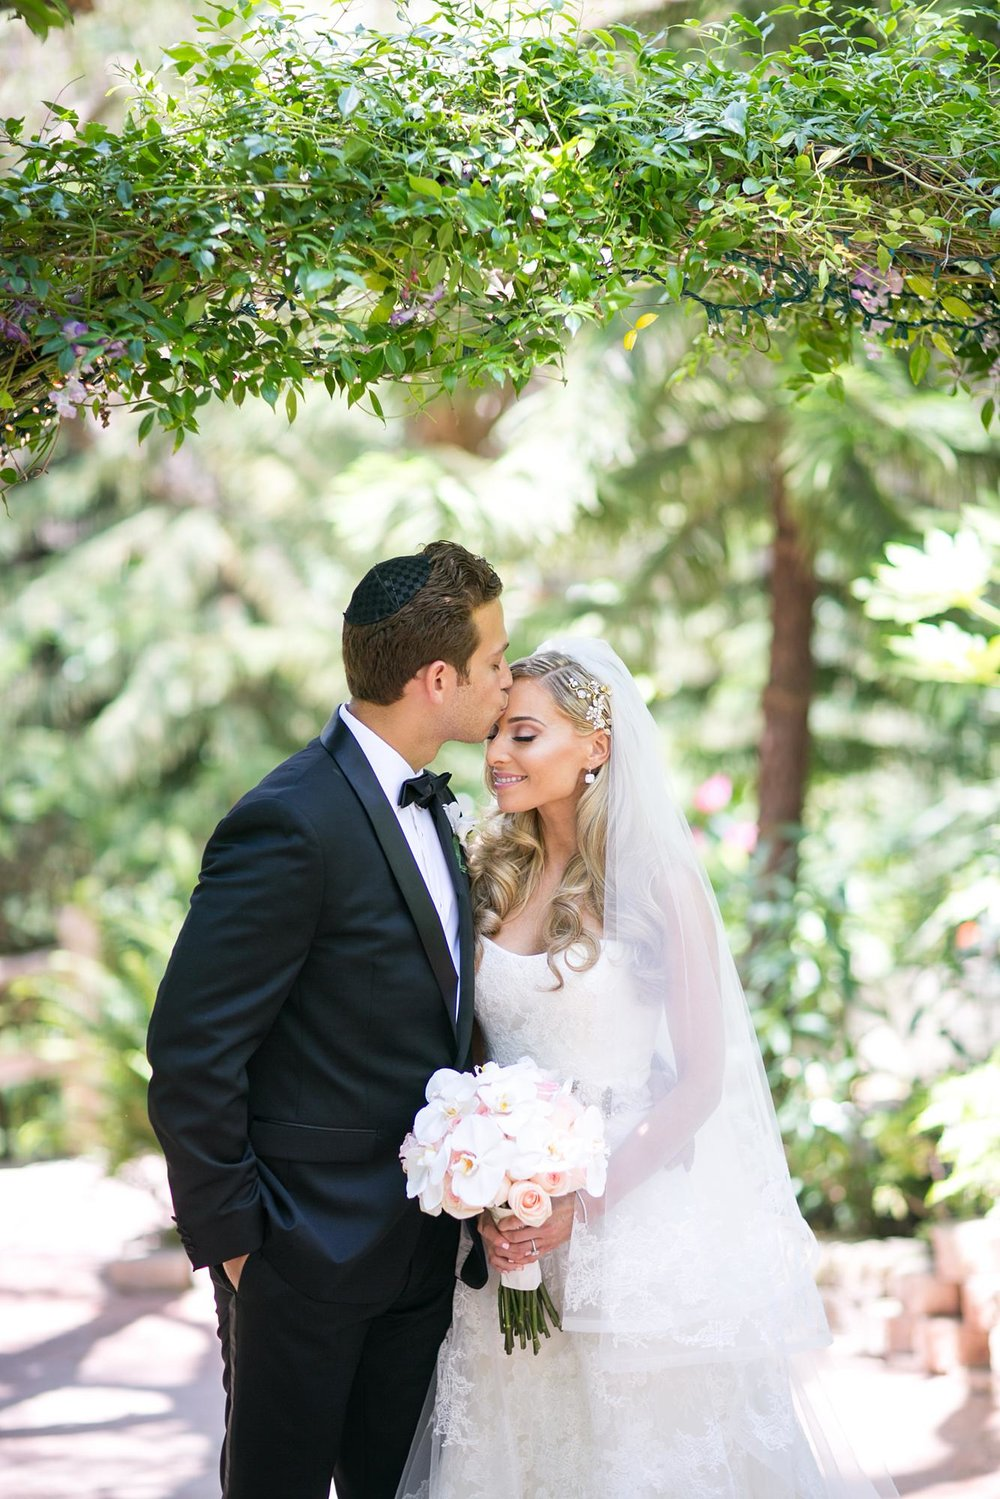 The Vineyards Simi Valley Wedding | Miki & Sonja Photography | mikiandsonja.com